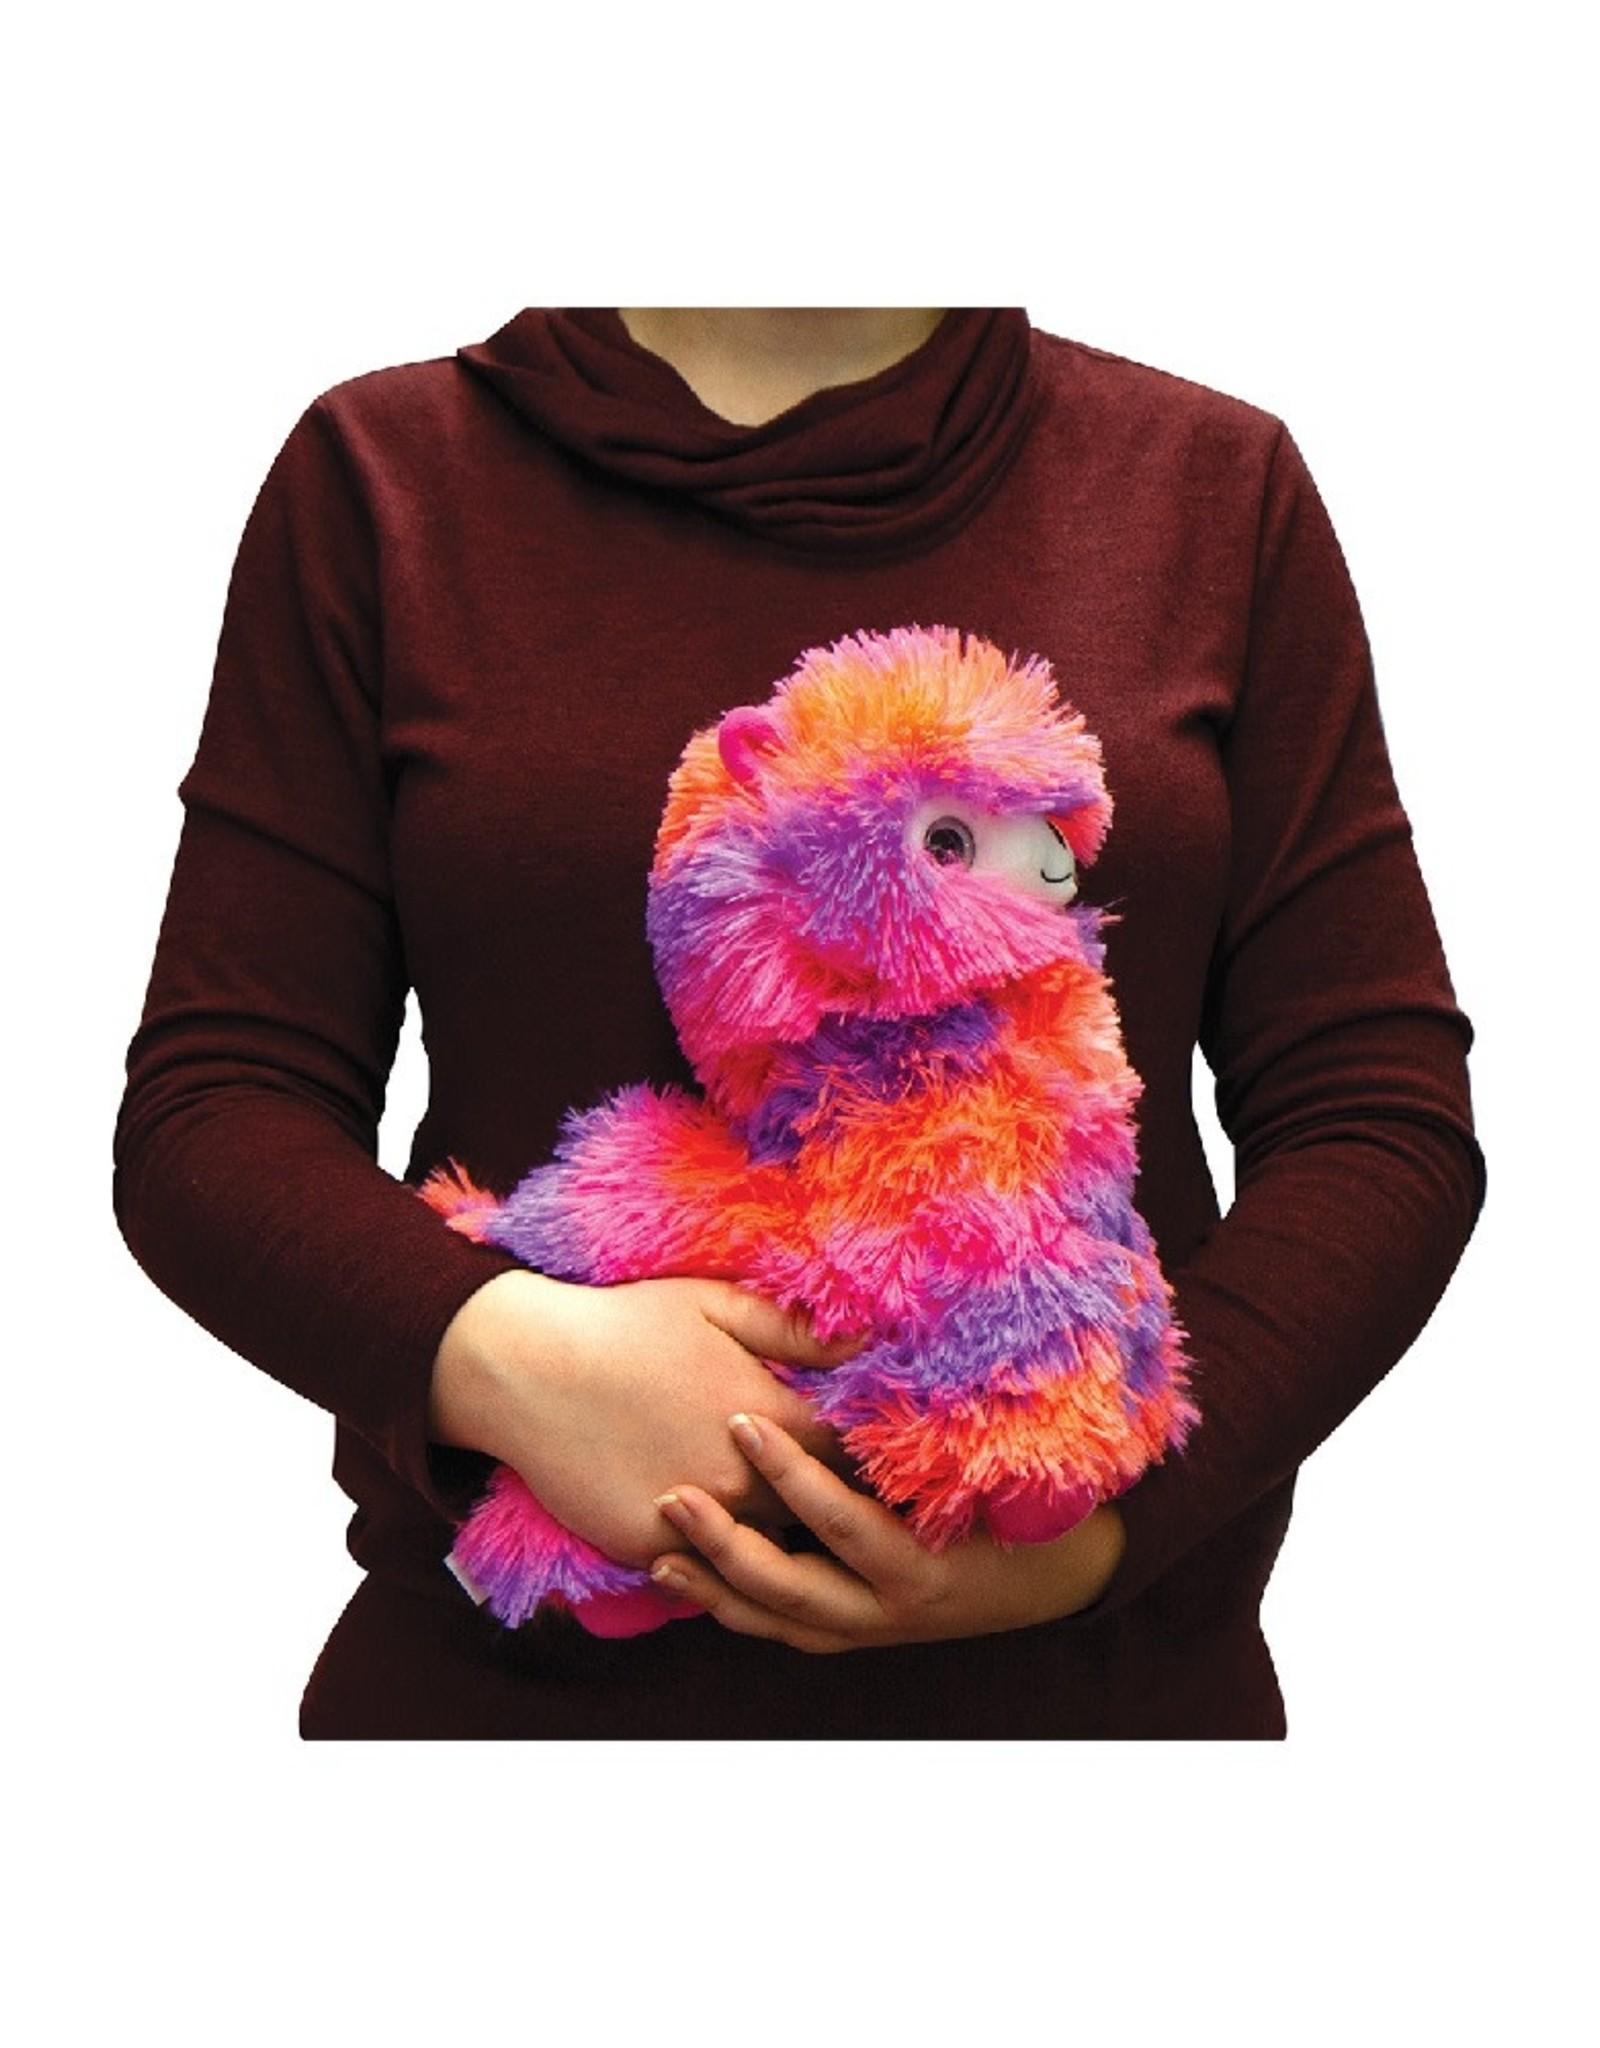 Fashion Angels Alpaca Plush -Small -Neon Pink, Peach & Purple